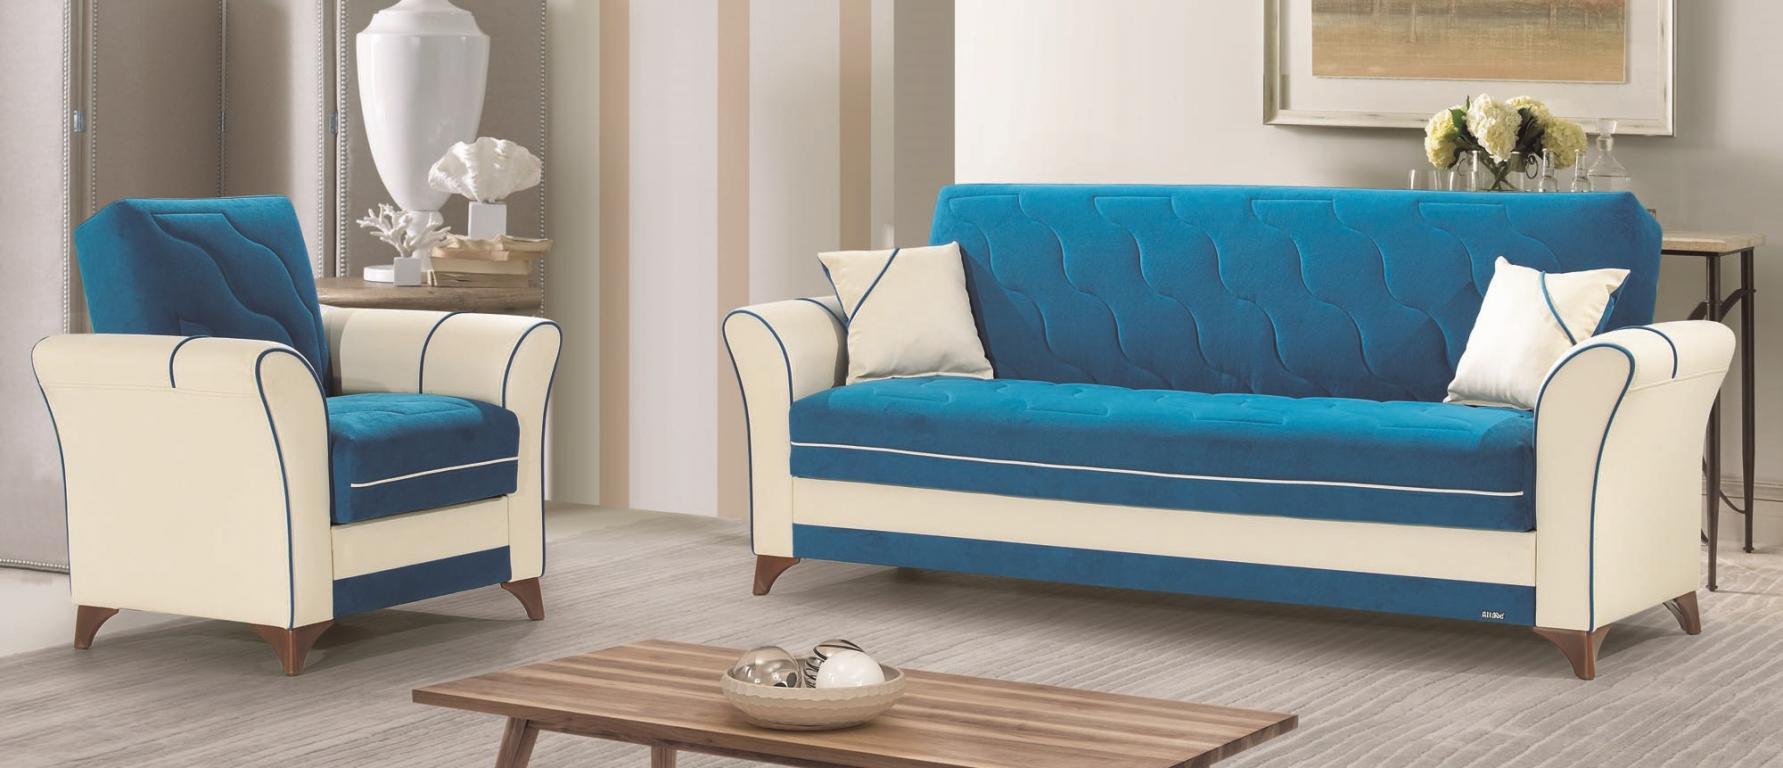 Isil-1 Maxi Sofa Set 3+2+1 – Yuvam Möbelhaus in Wuppertal | Cilek ...